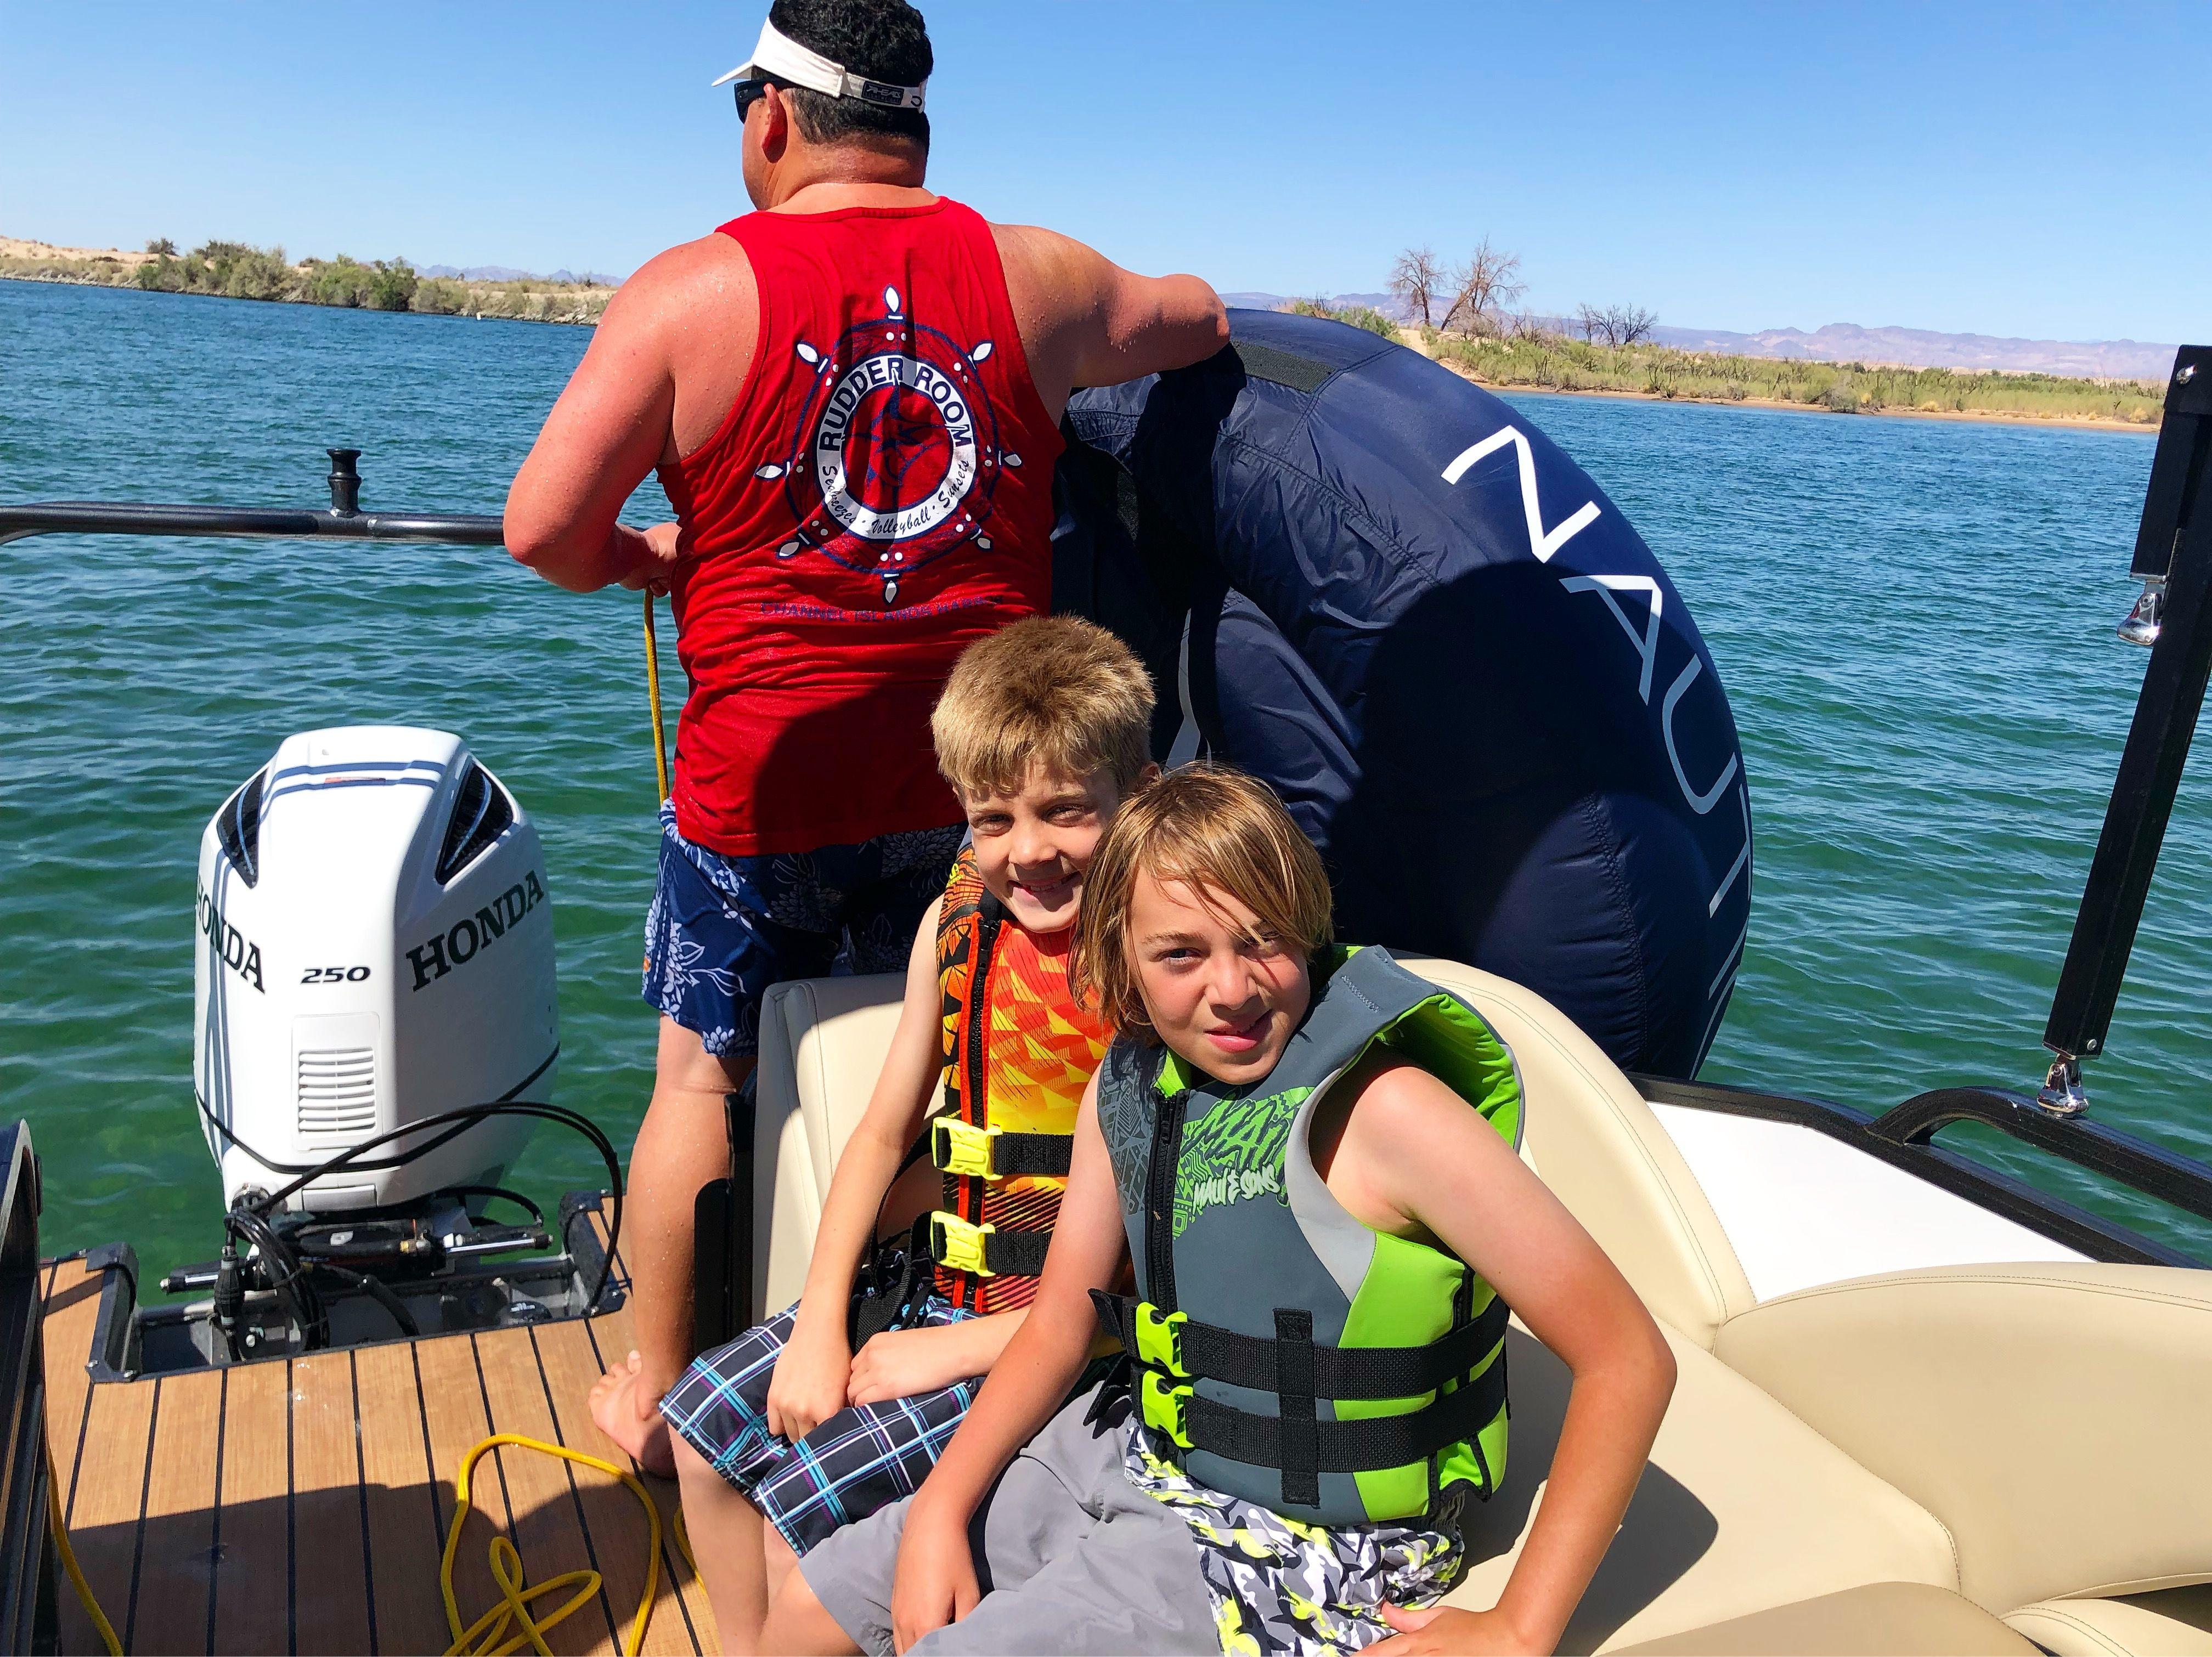 Lake havasu boating safety rules and regulations boat